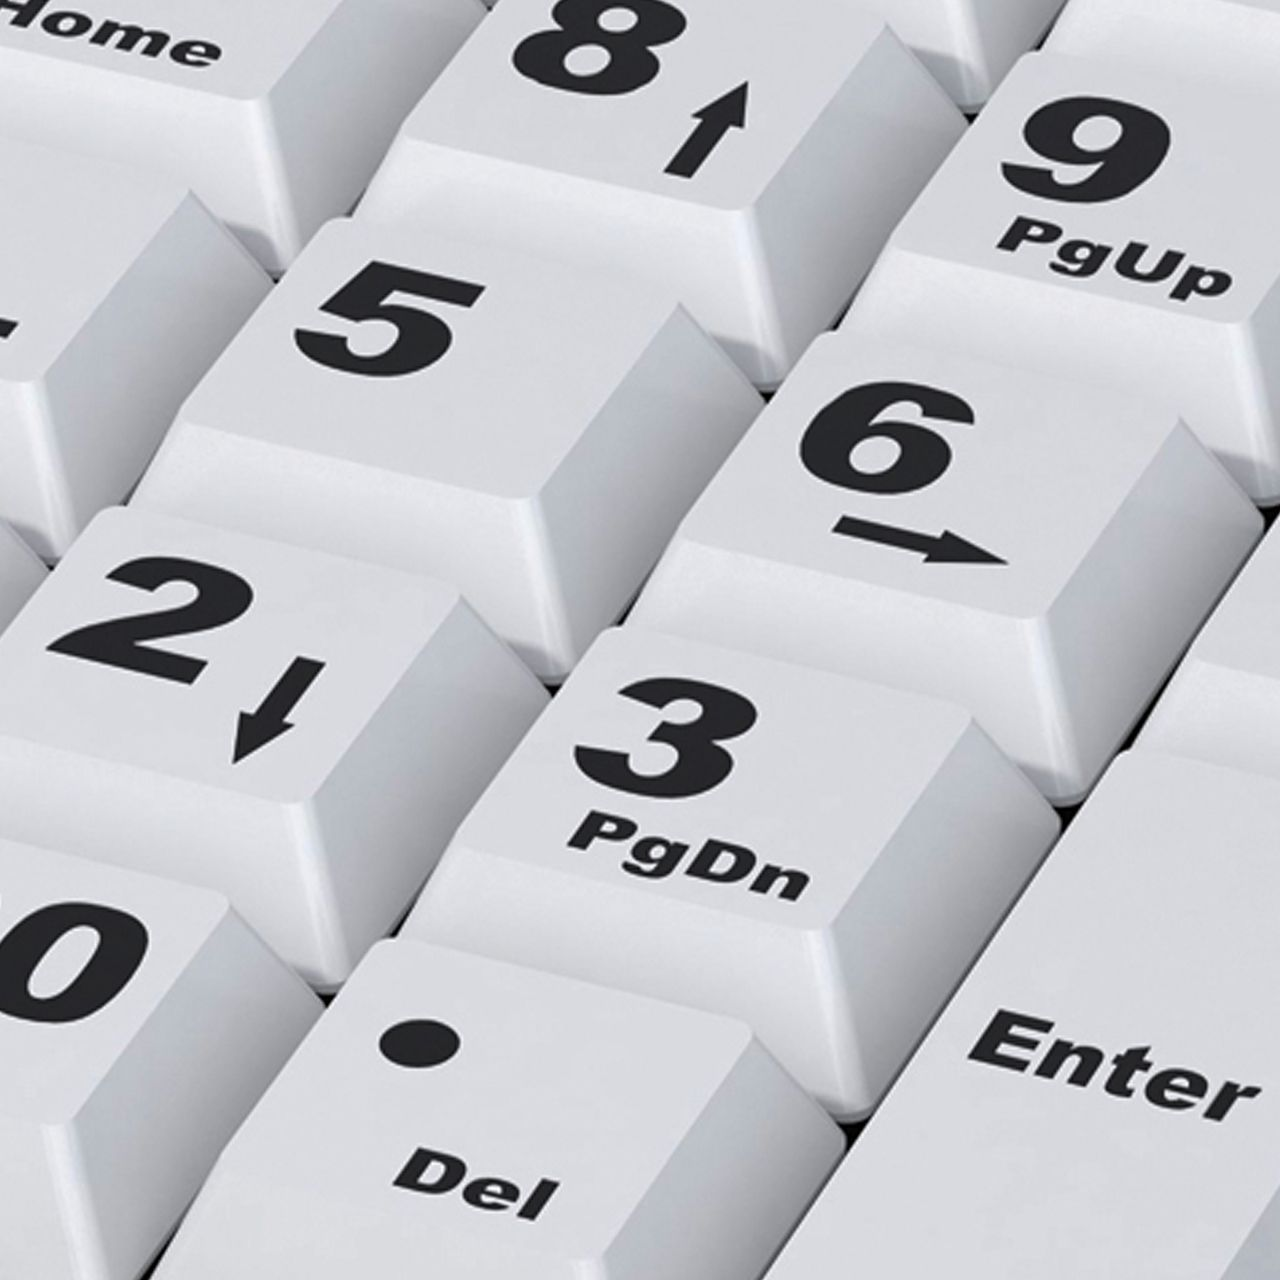 Big-keyboard-numeriek-hulpmiddelen-slechtzienden-erkabke102_0000s_0000_detail